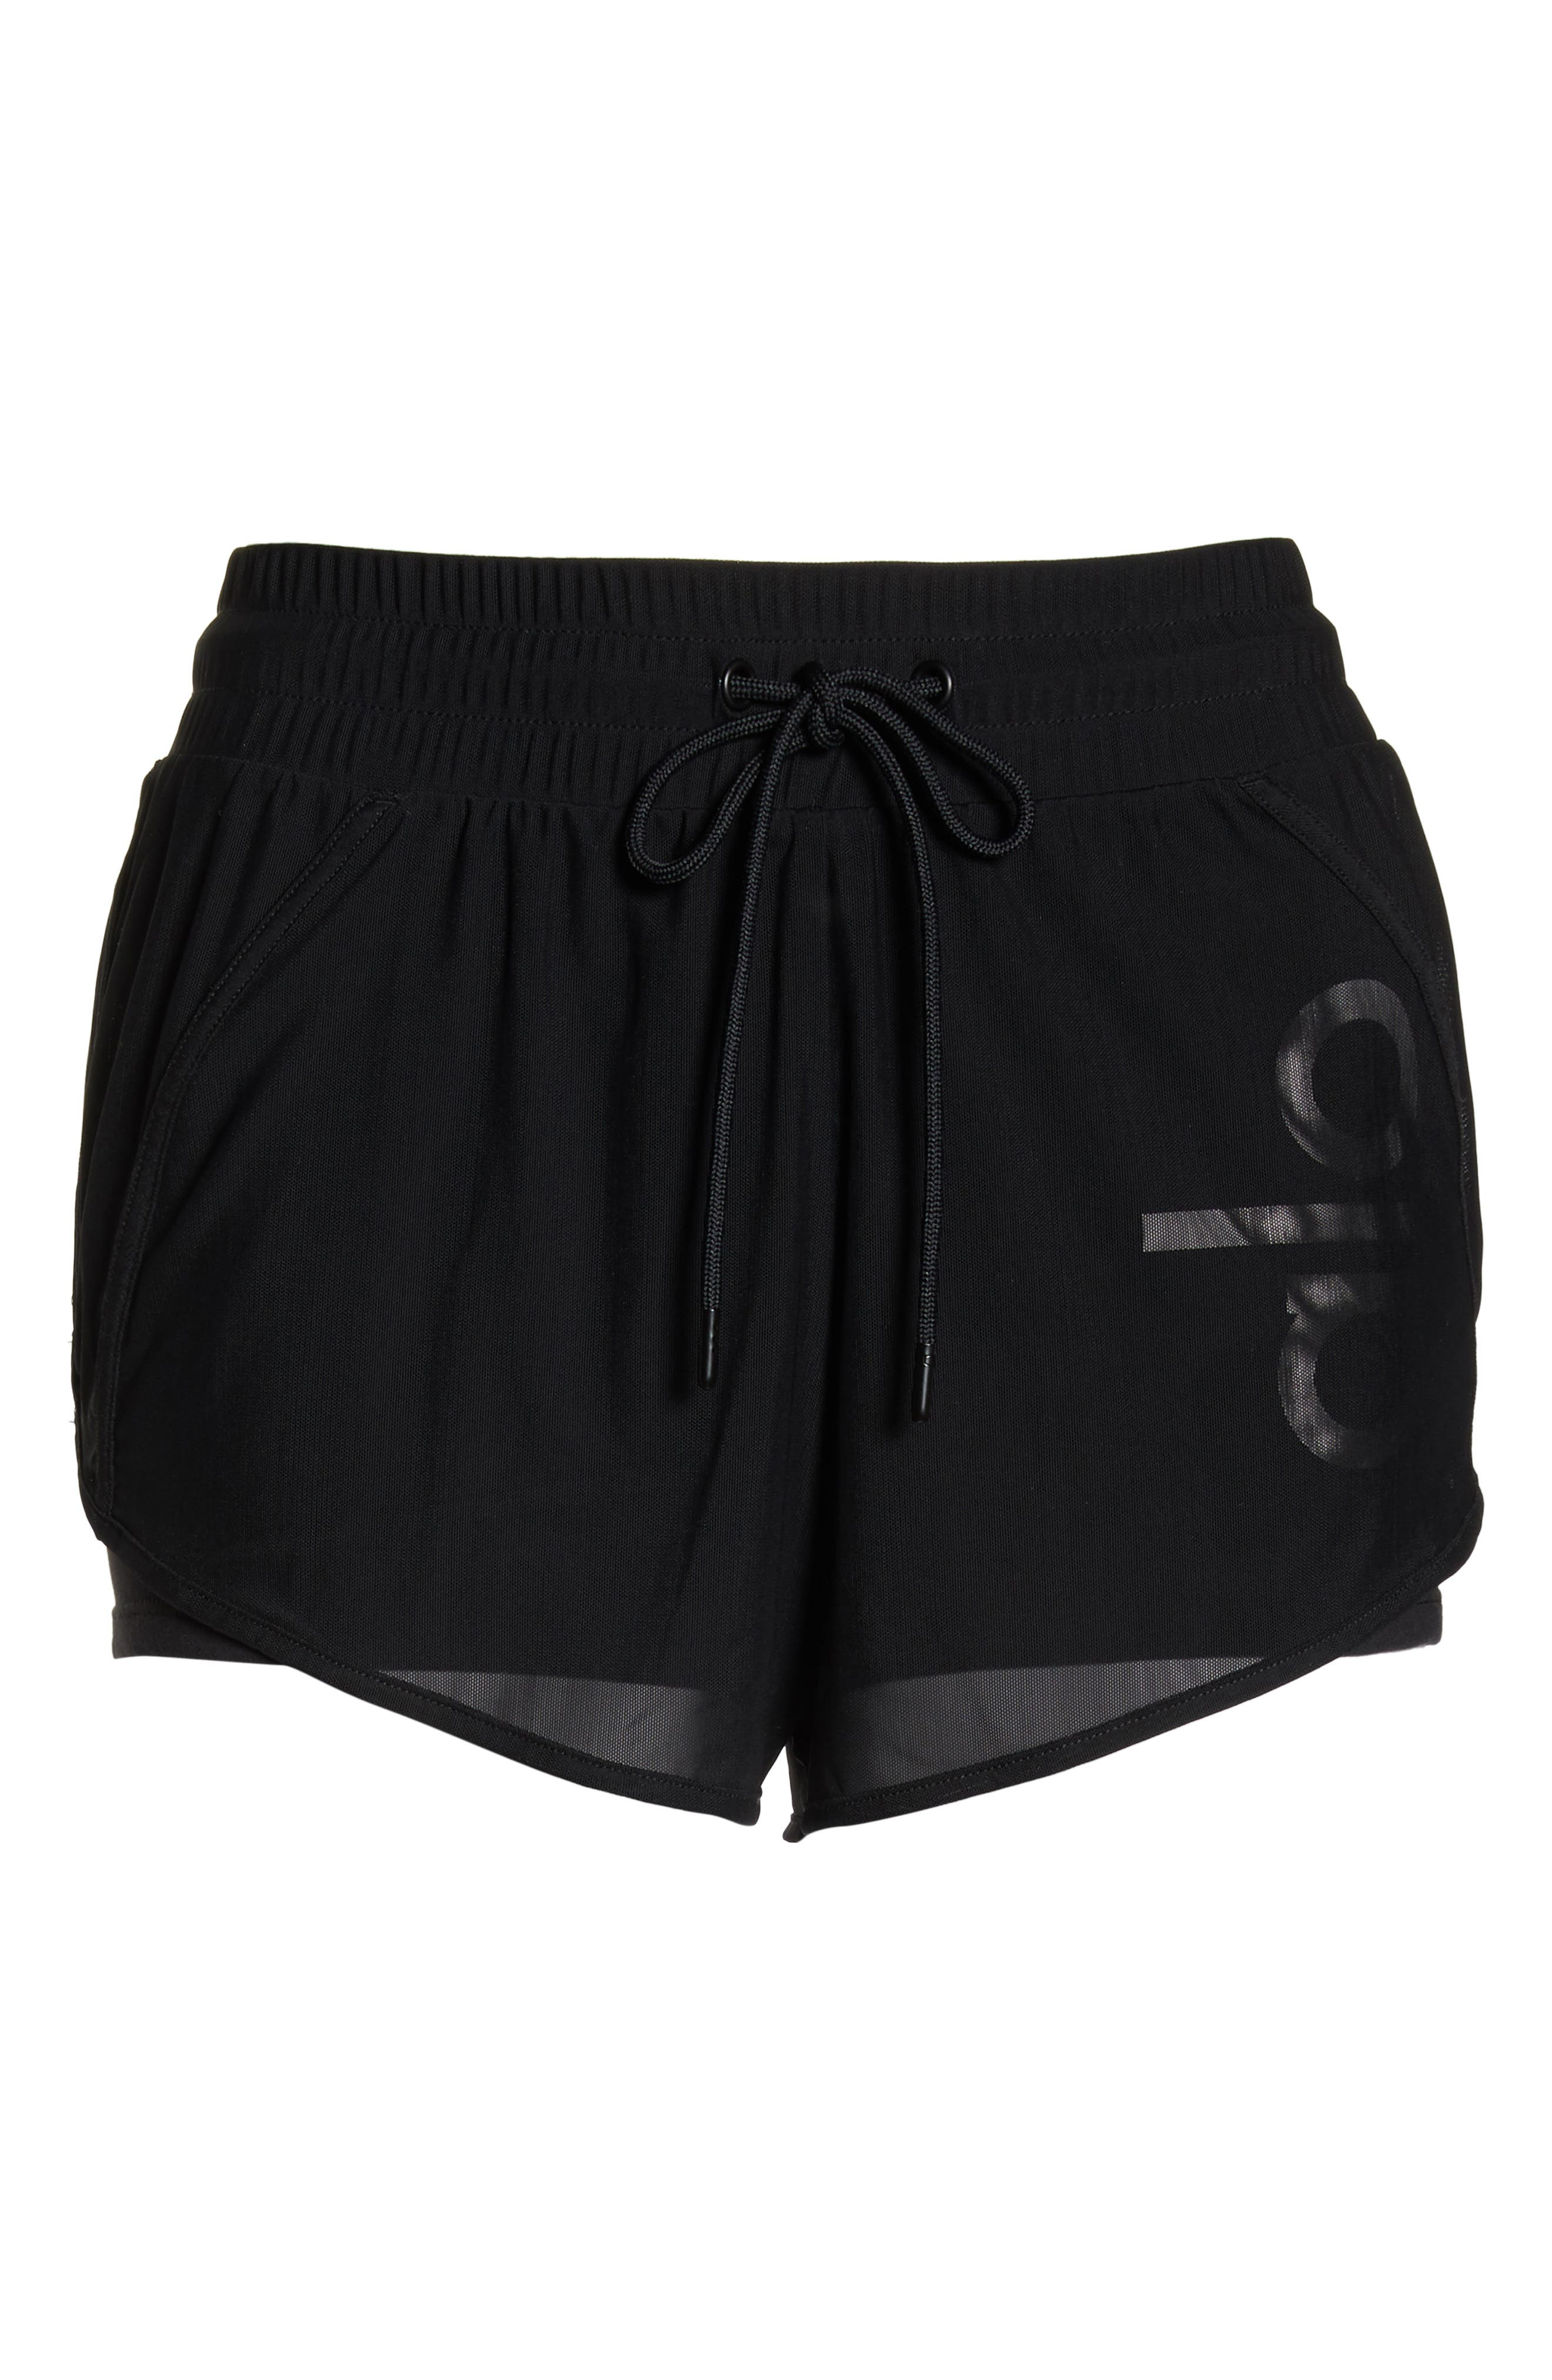 Ambience Shorts,                             Alternate thumbnail 7, color,                             BLACK/ BLACK/ ALO/ WHITE